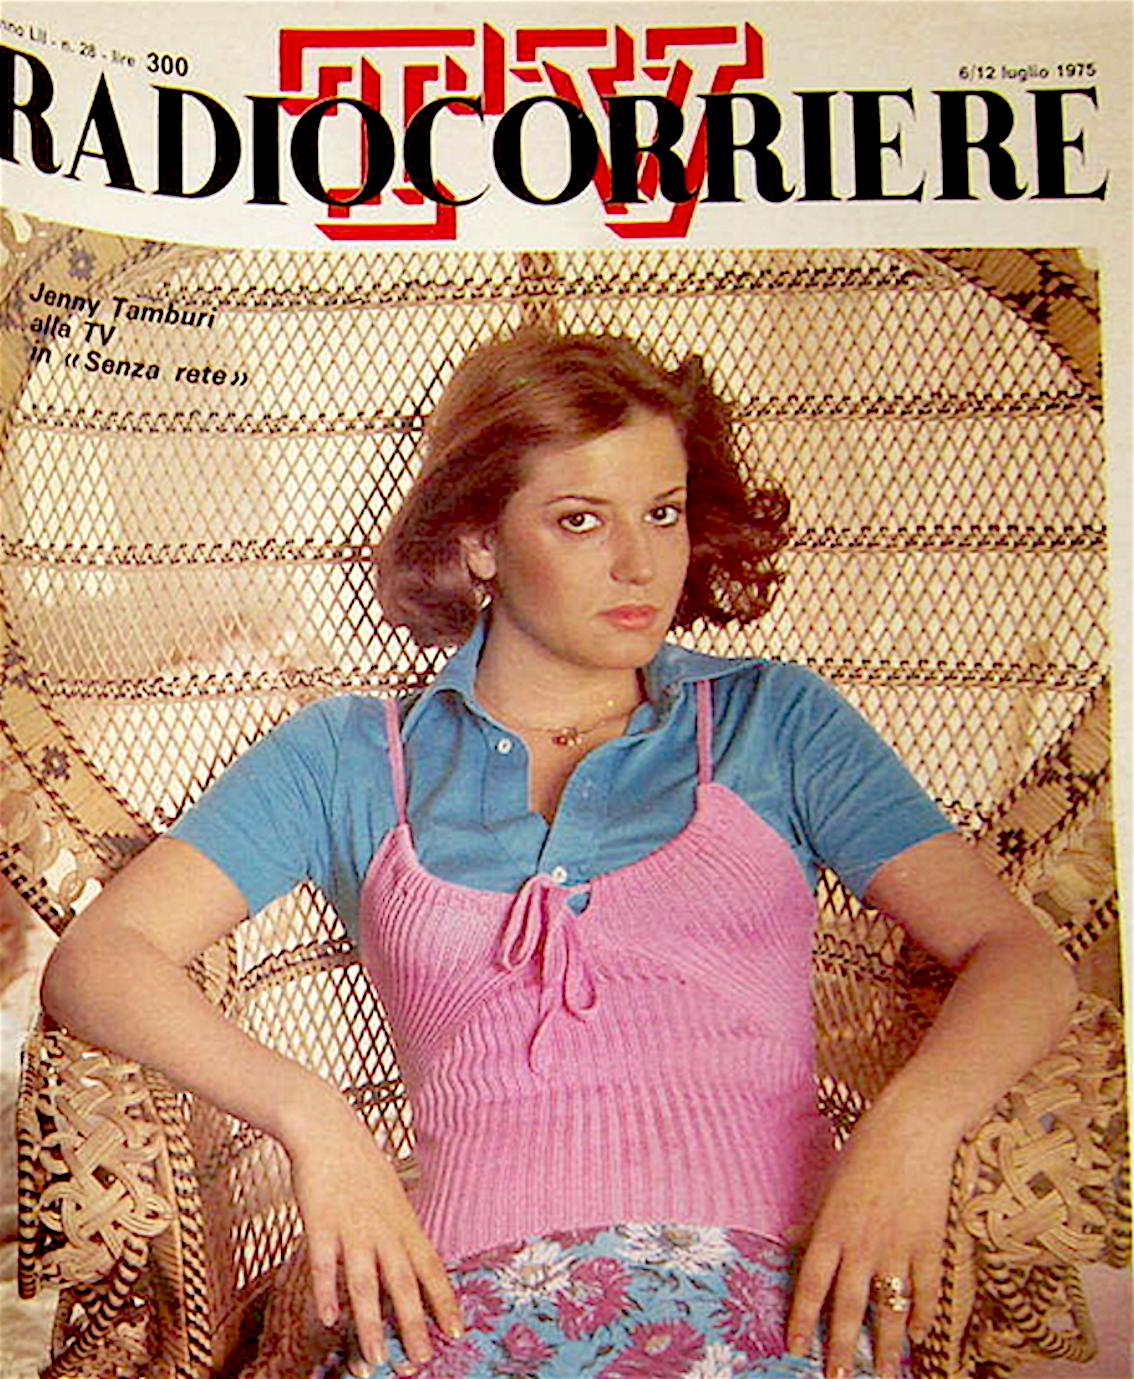 jenny_tamburi_radiocorriere_1975_morta